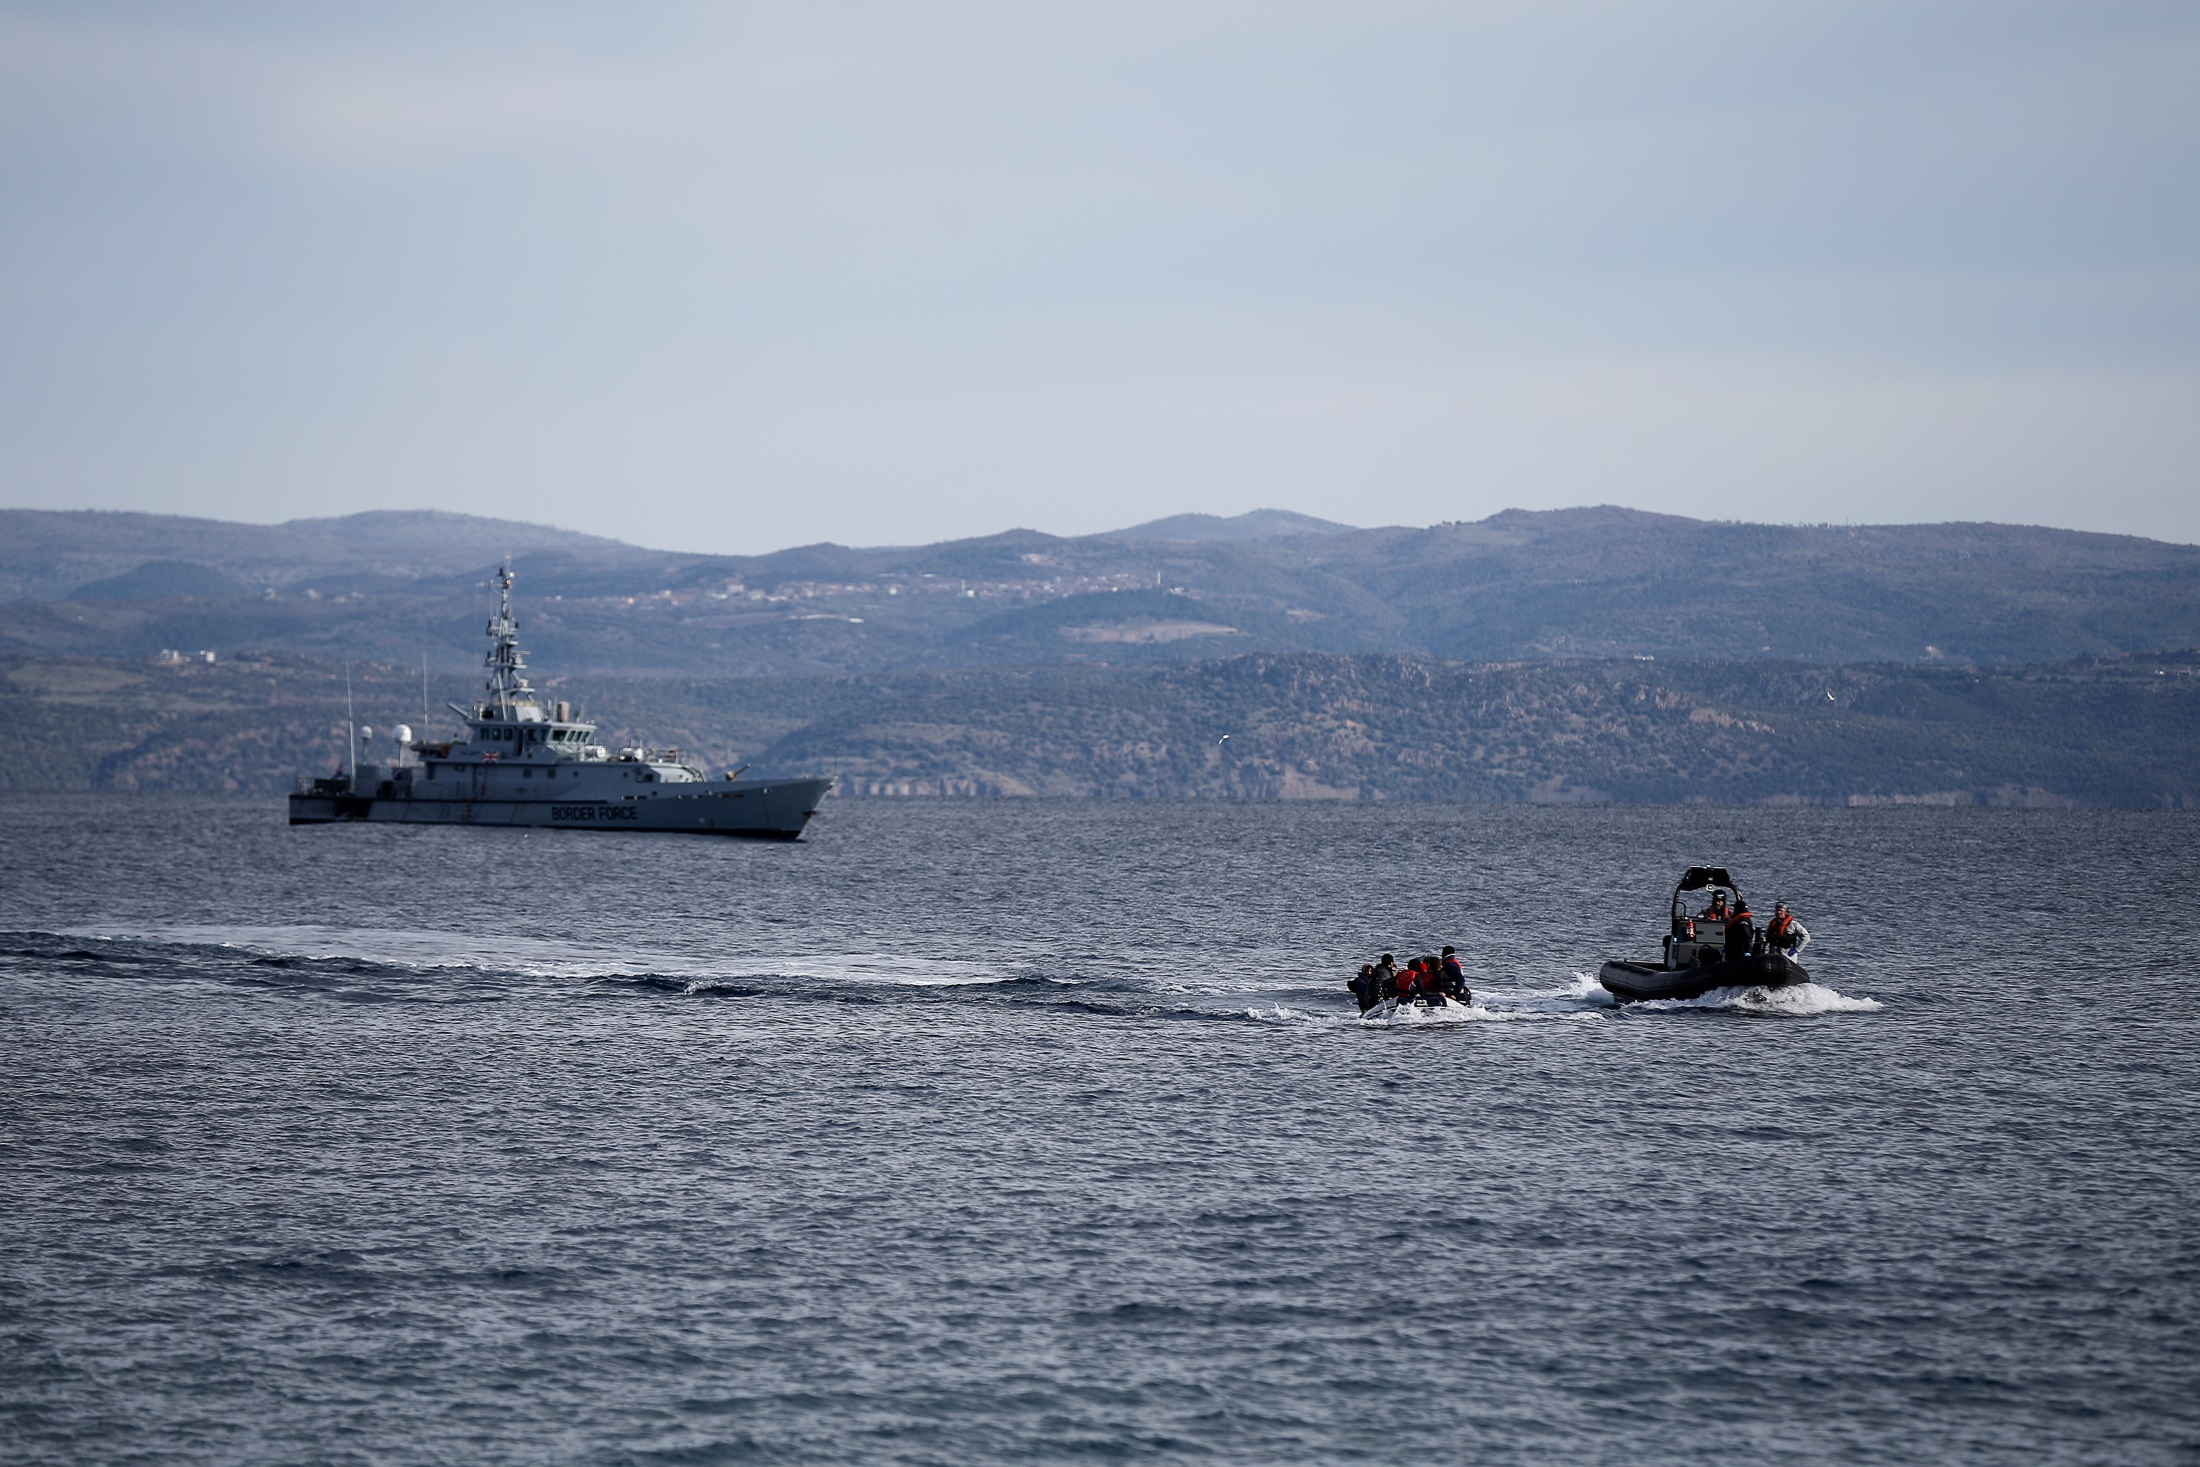 Frontex: Δεν υπάρχουν ενδείξεις για επαναπροωθήσεις αιτούντων άσυλο